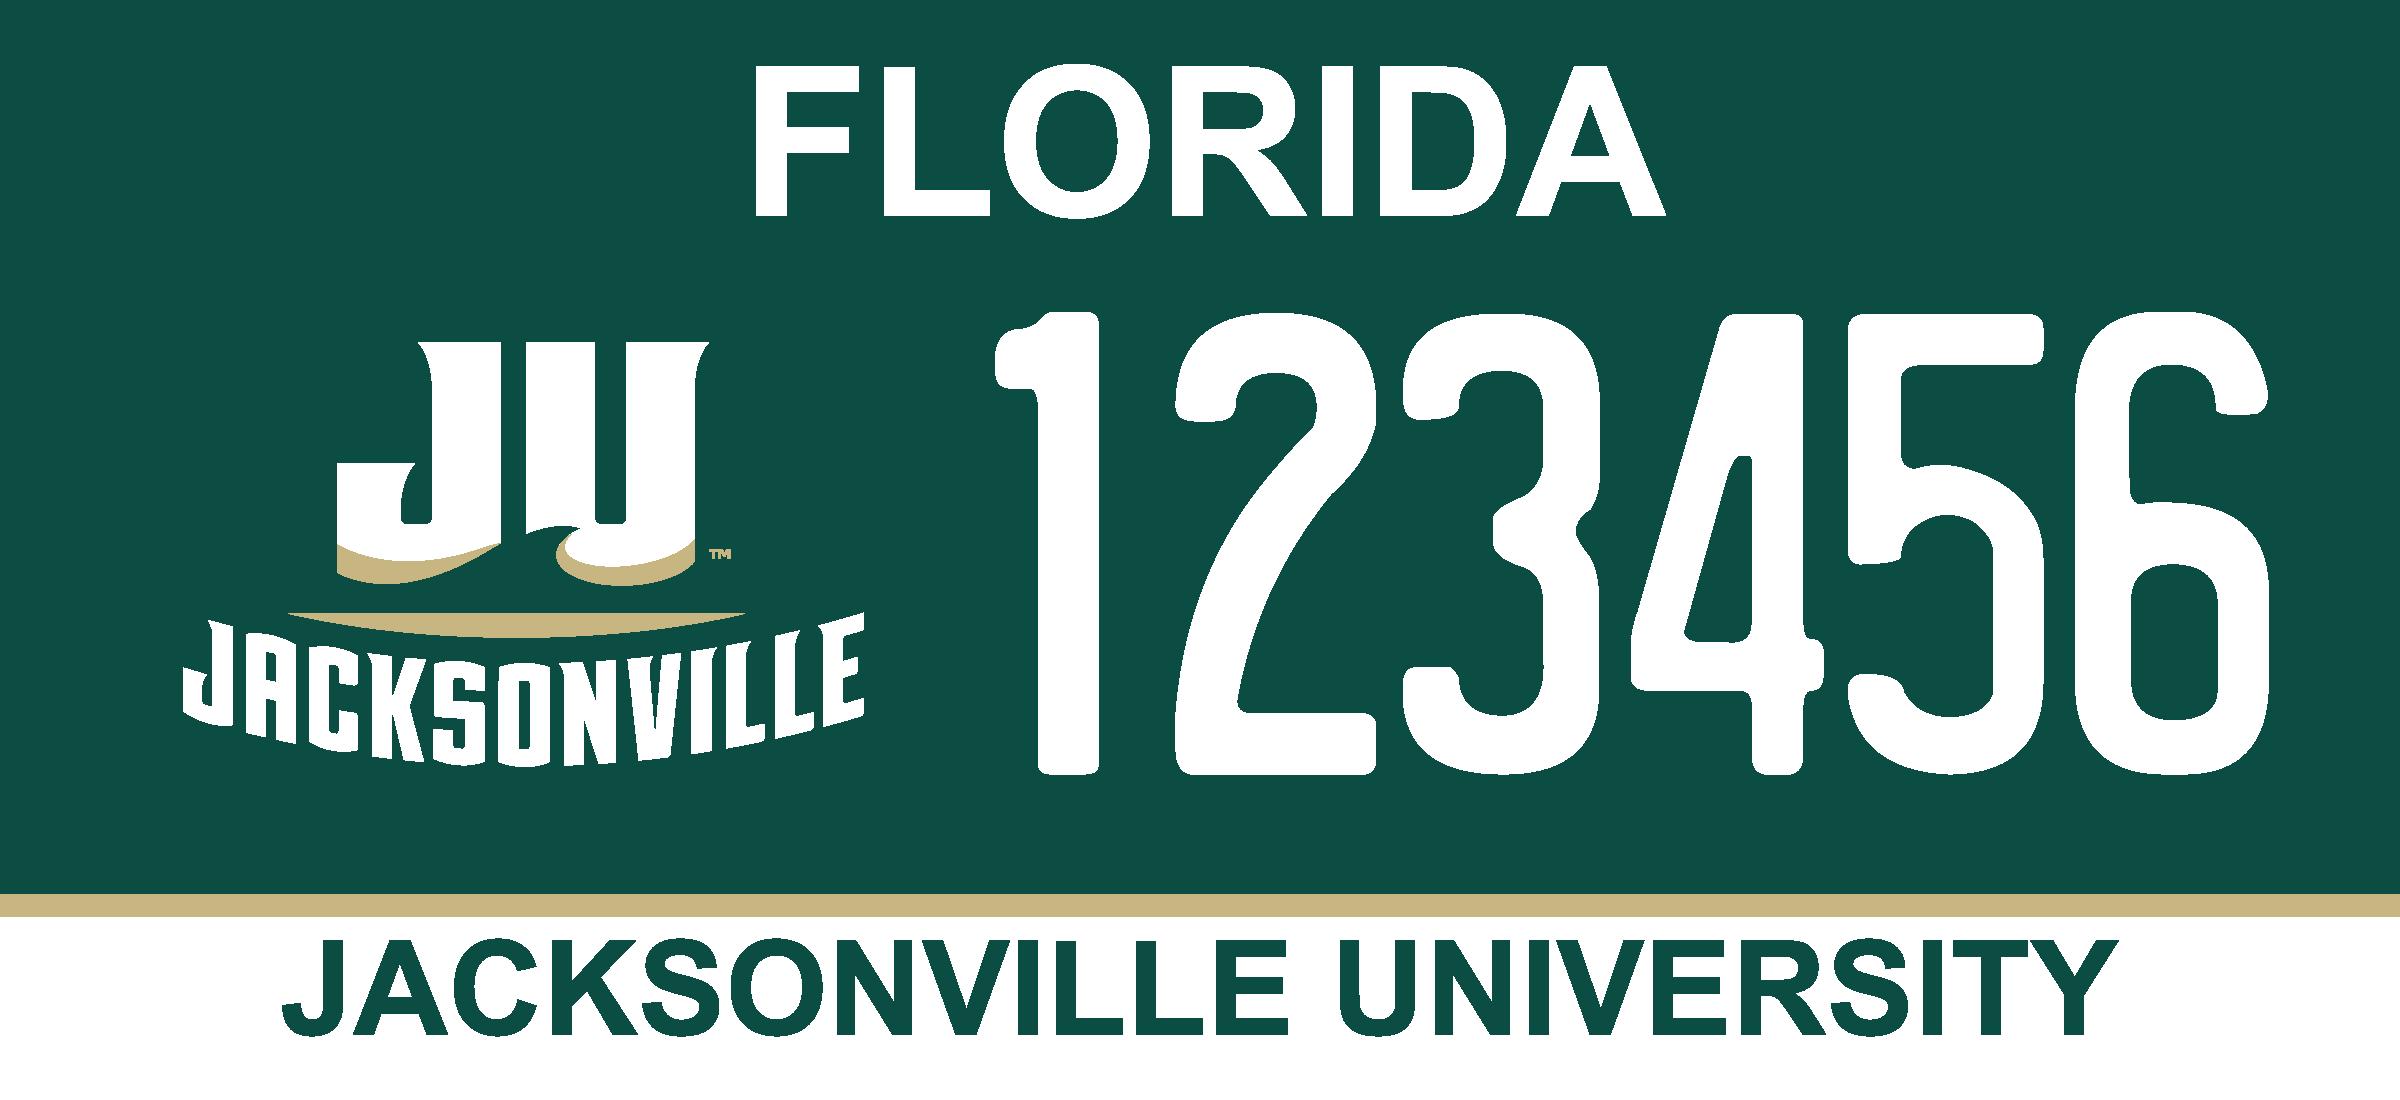 License Plates | Jacksonville University in Jacksonville, Fla